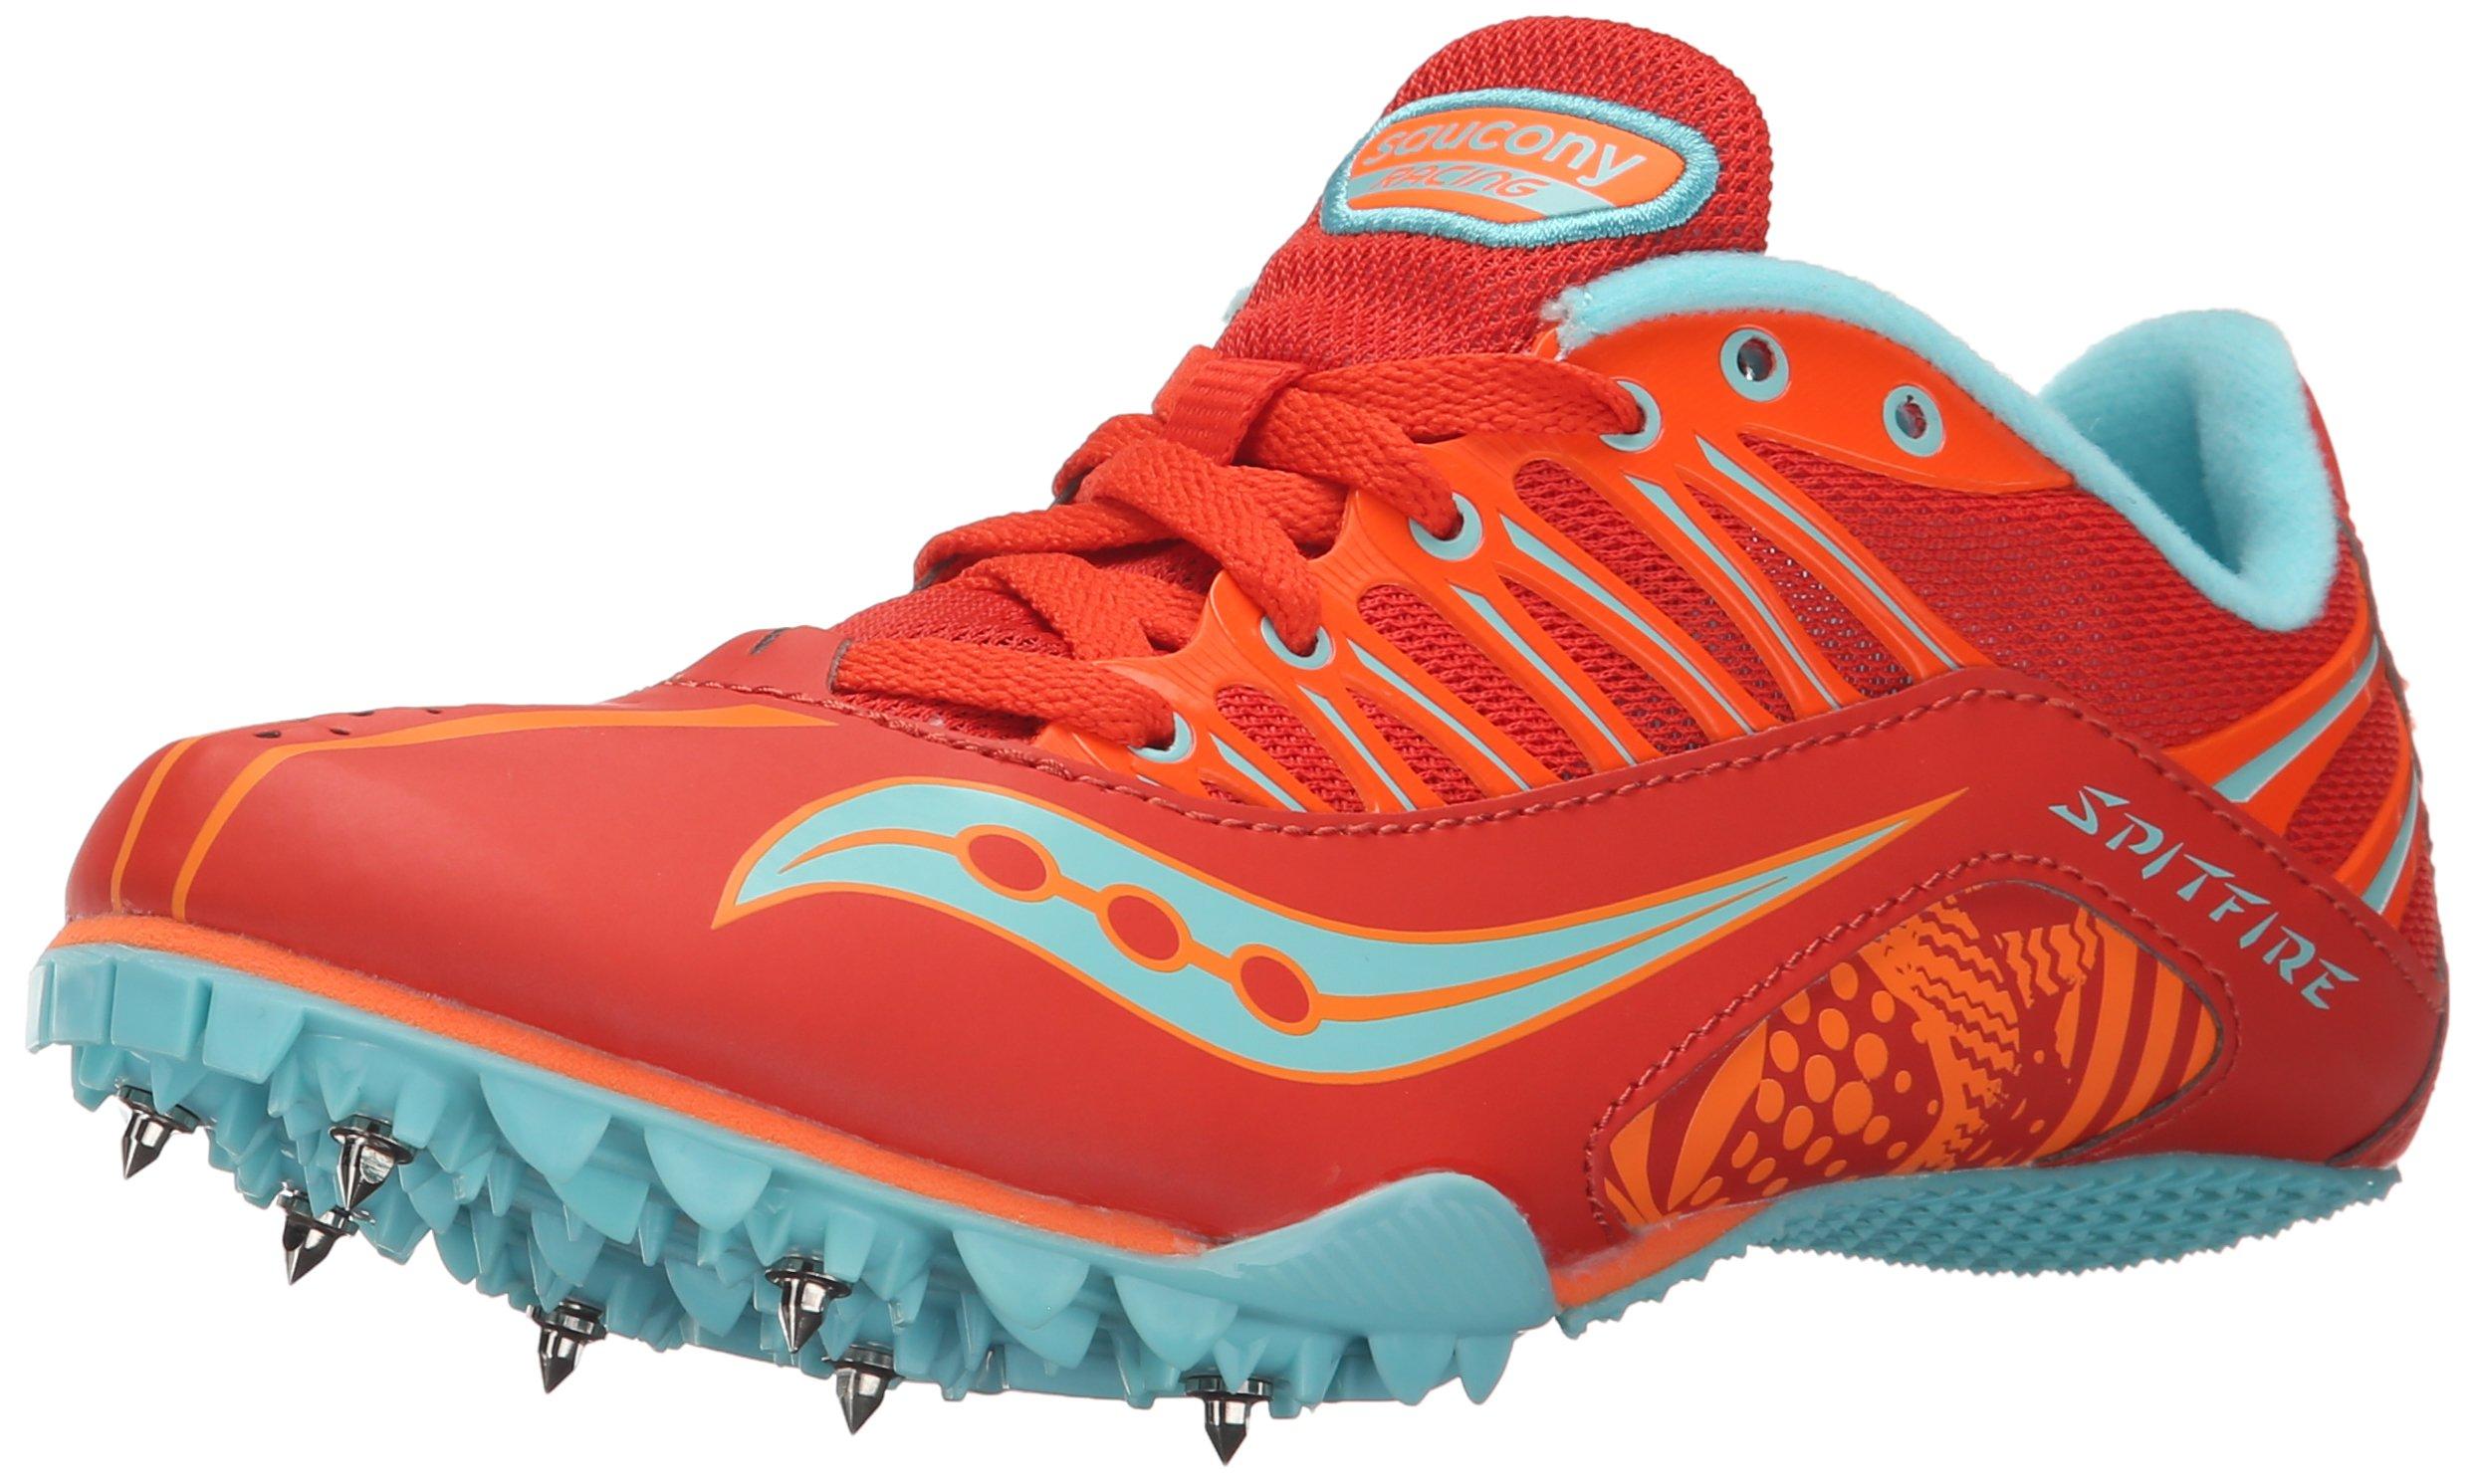 Saucony Women's Spitfire Spike Shoe, Red/Orange/Blue, 8 M US